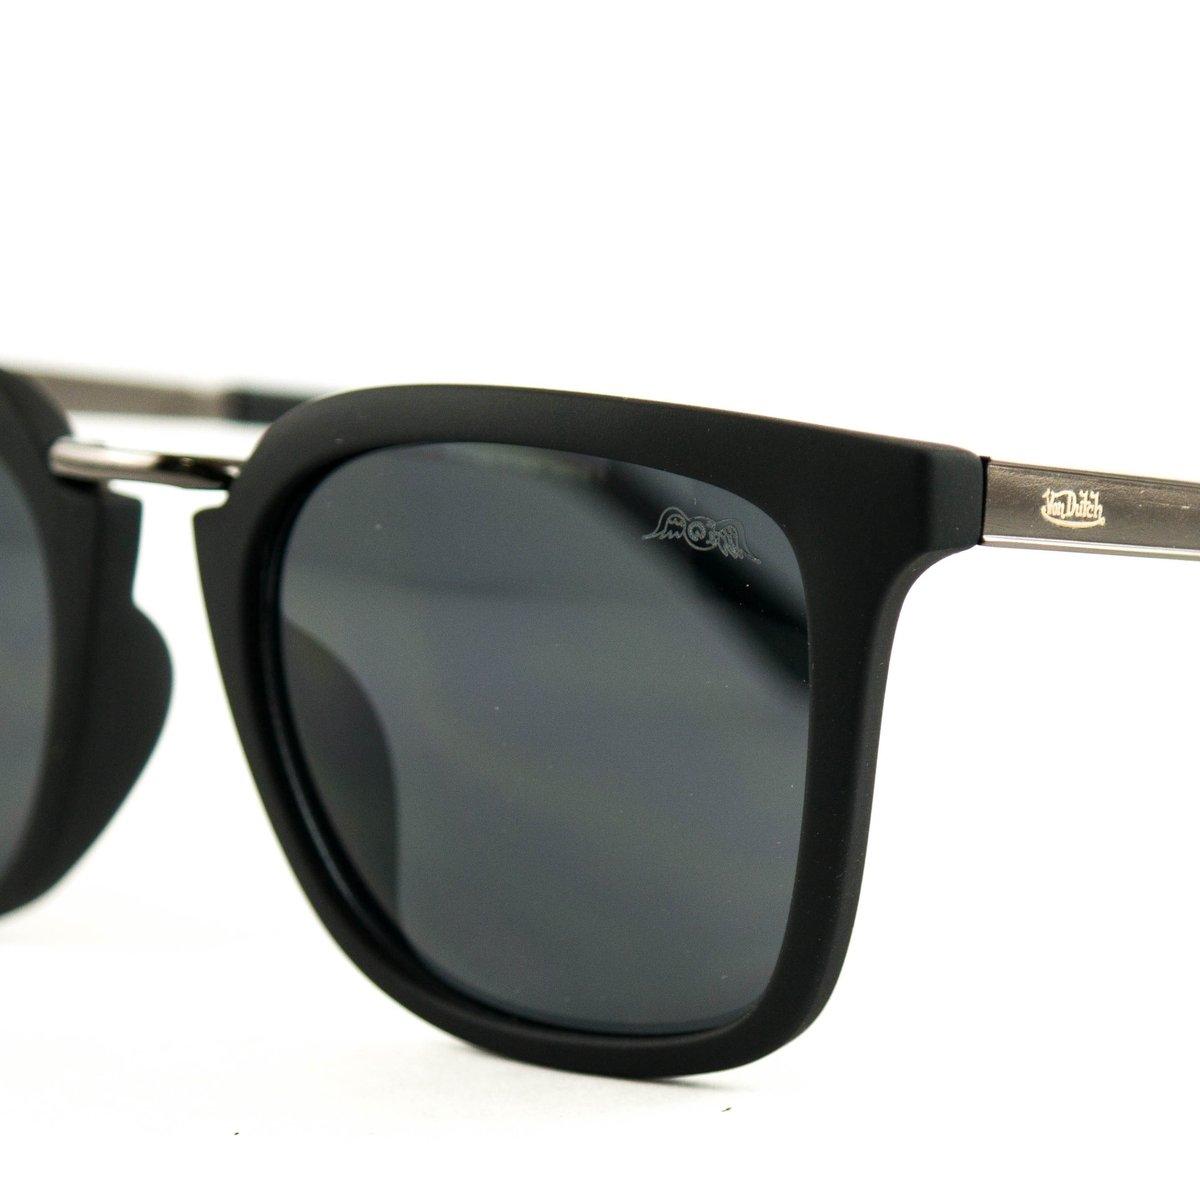 023054671e Óculos Von Dutch De Sol - Compre Agora